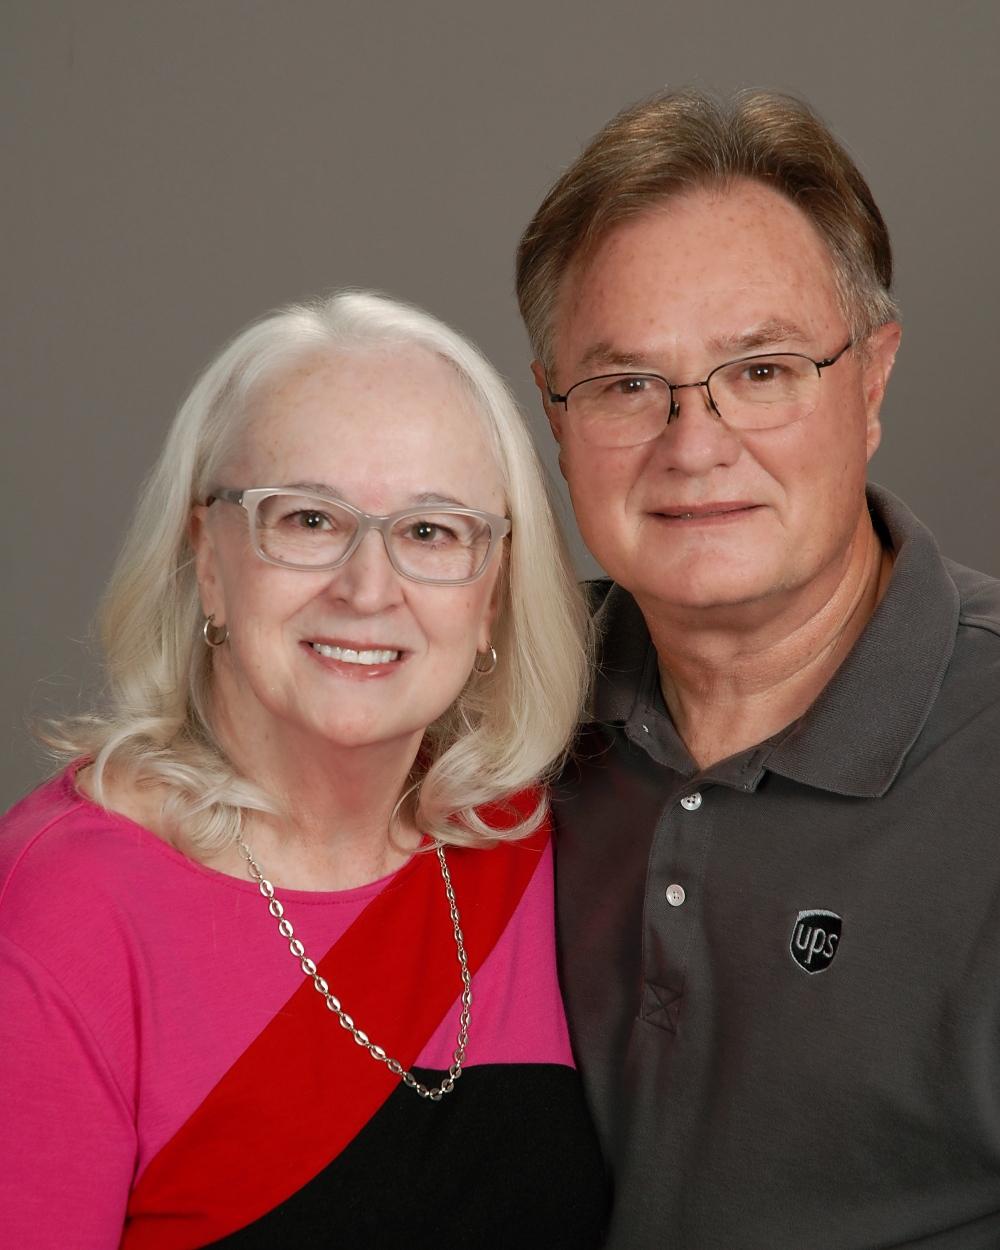 David Rucker - Senior Adult Director